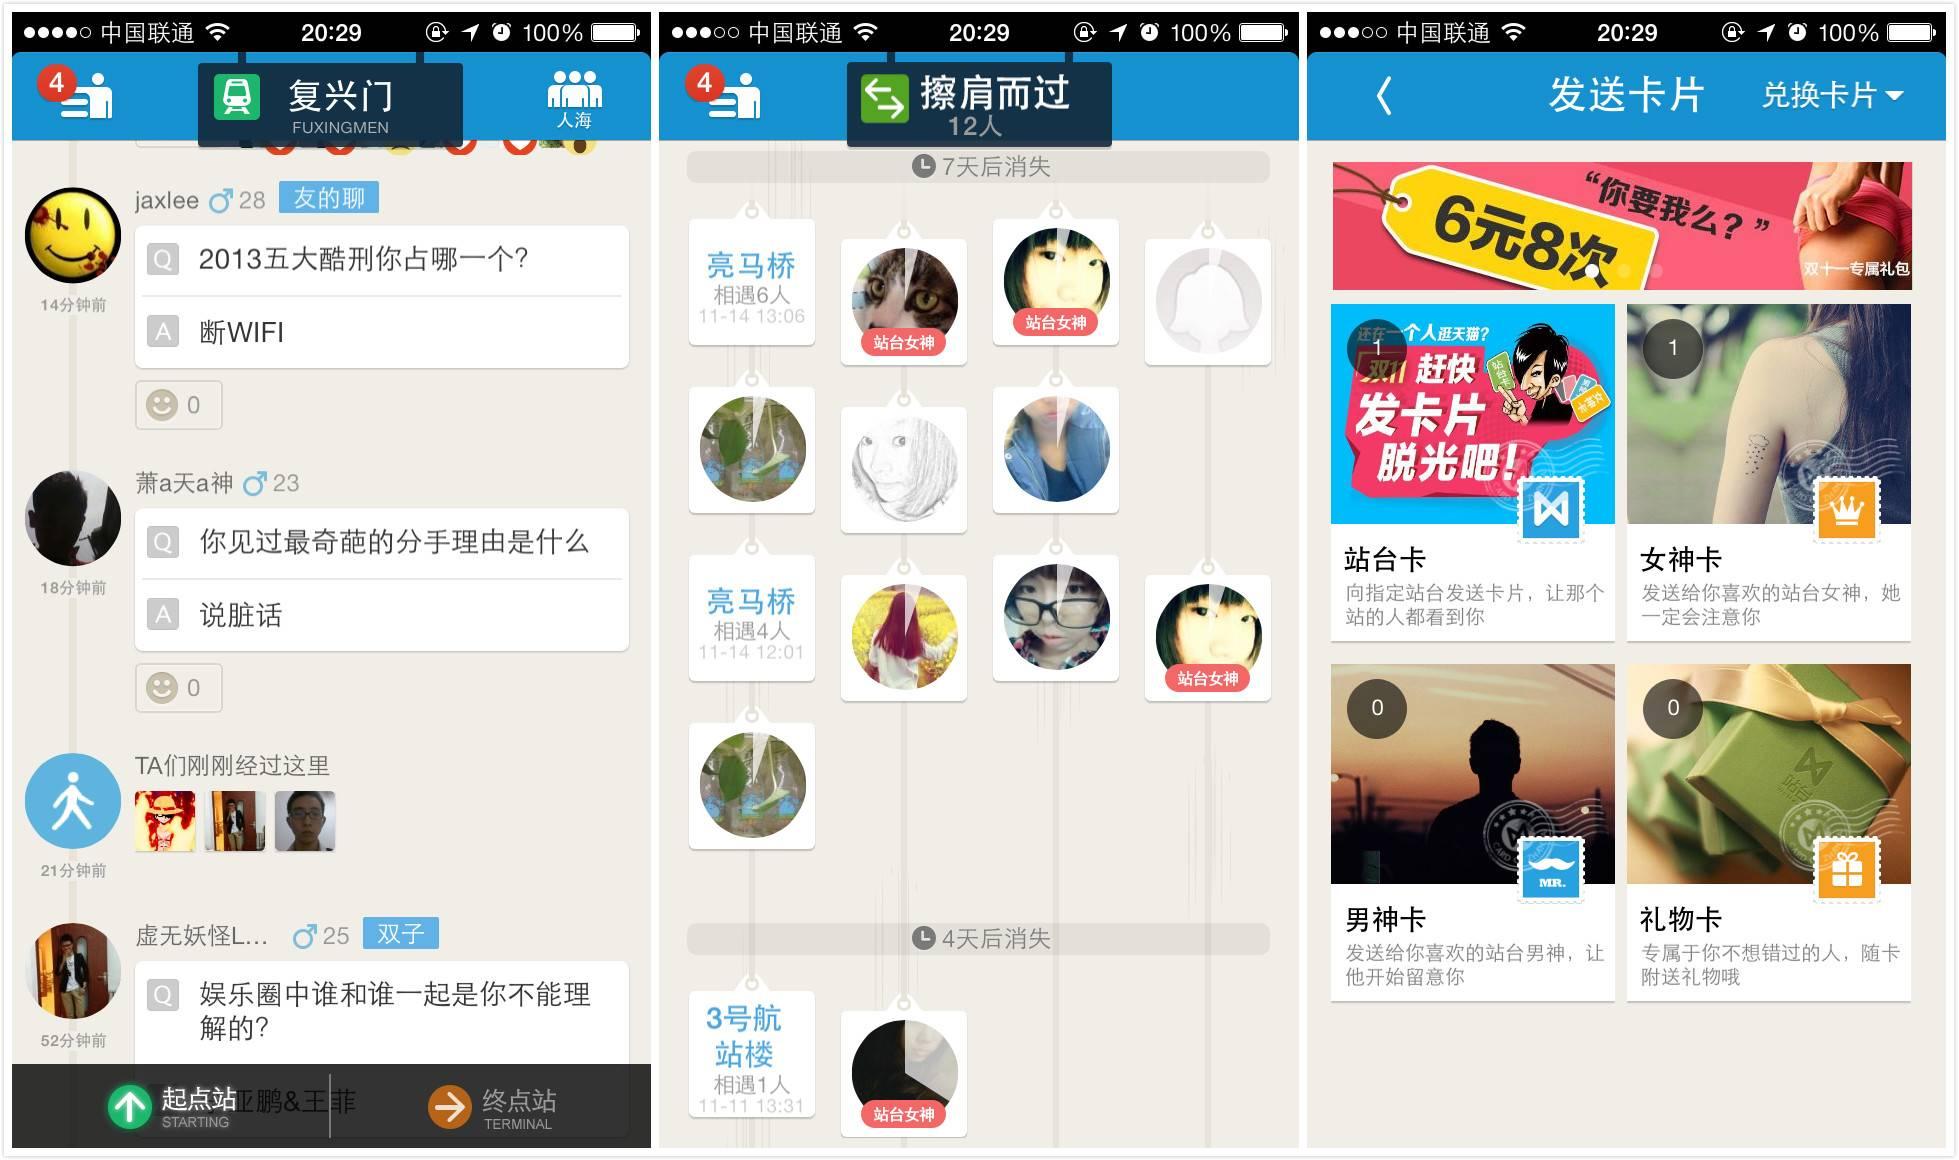 zhantai-youbao-life-sns-3